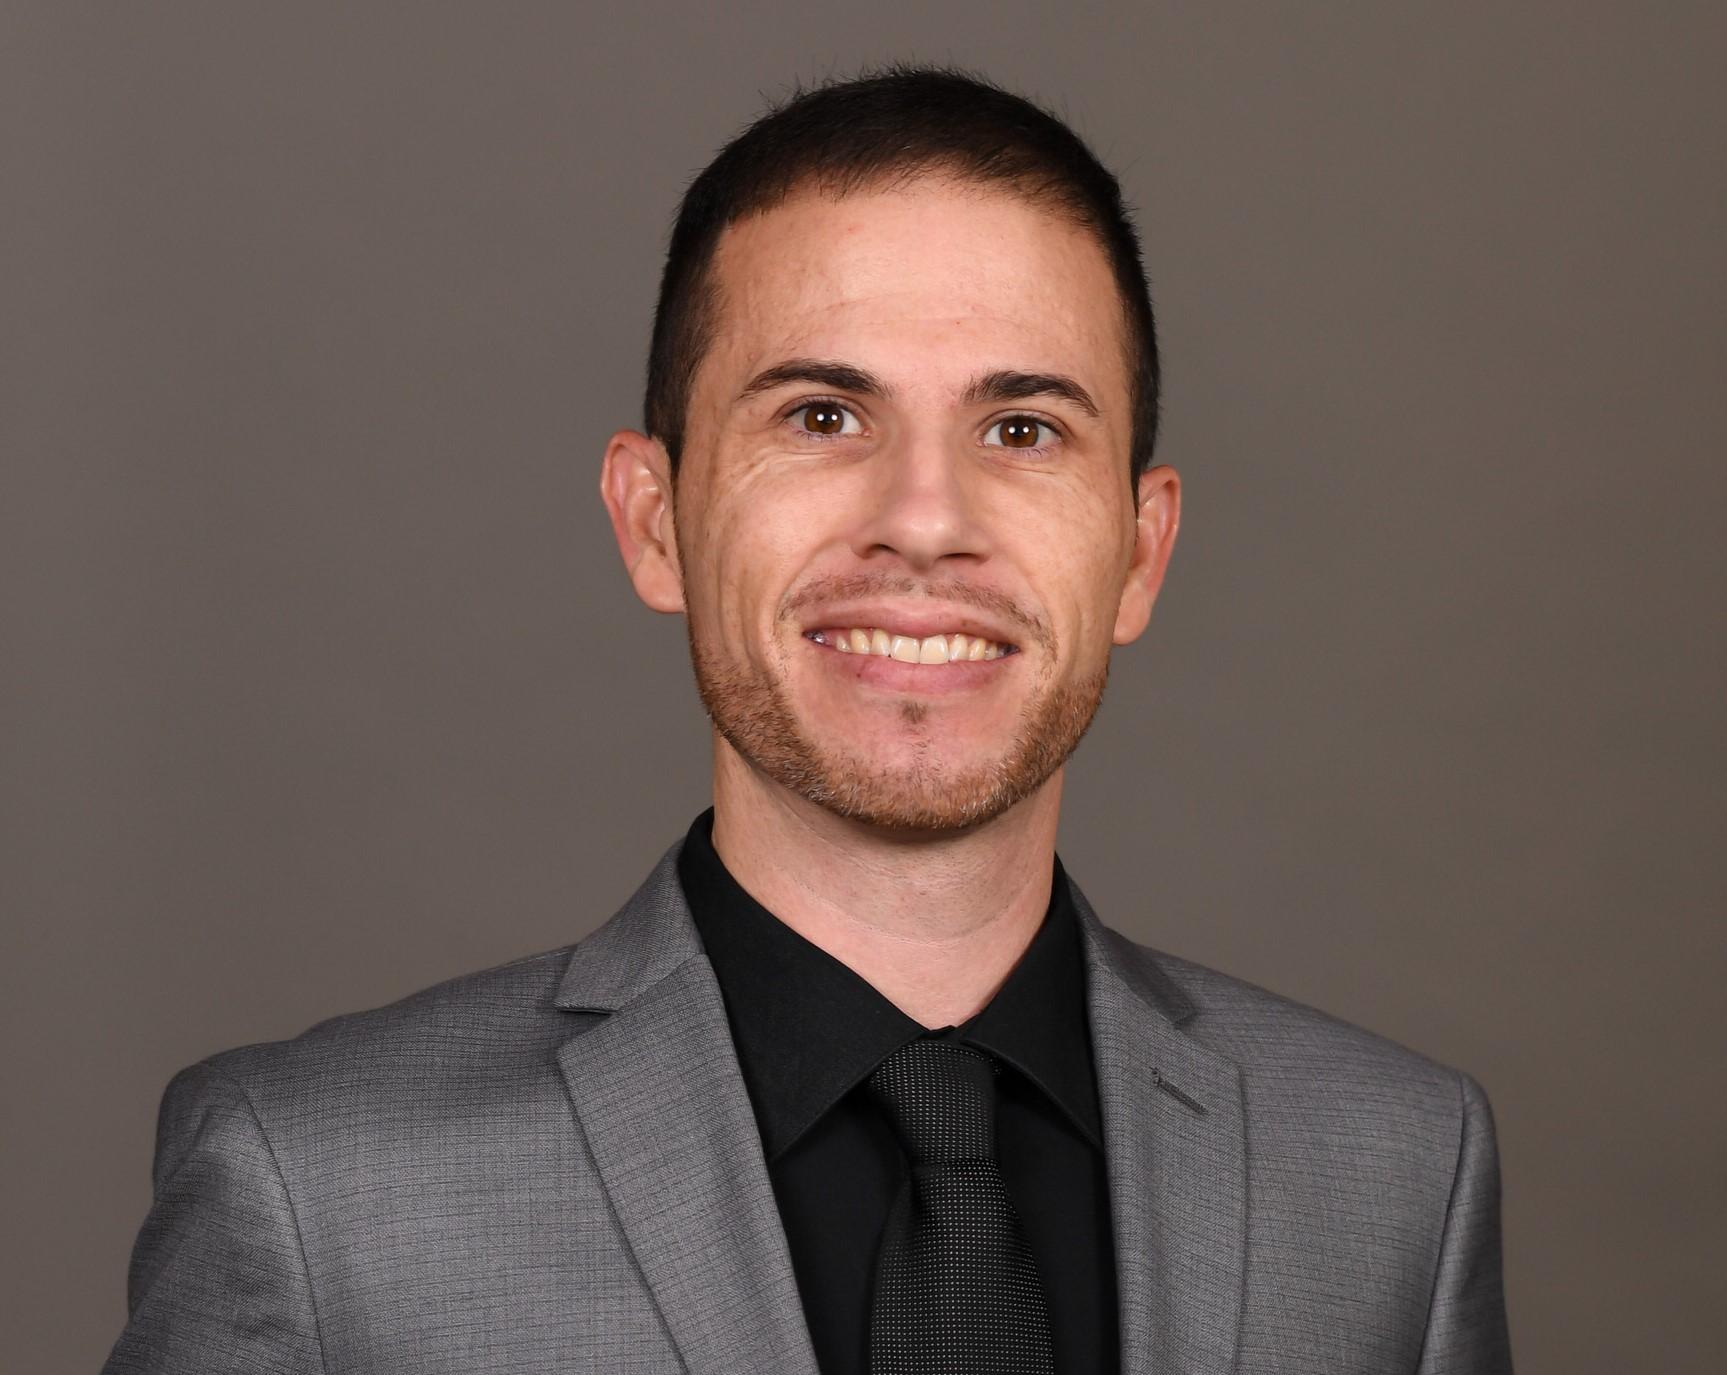 Vice President, VP of Marketing: David Kyle